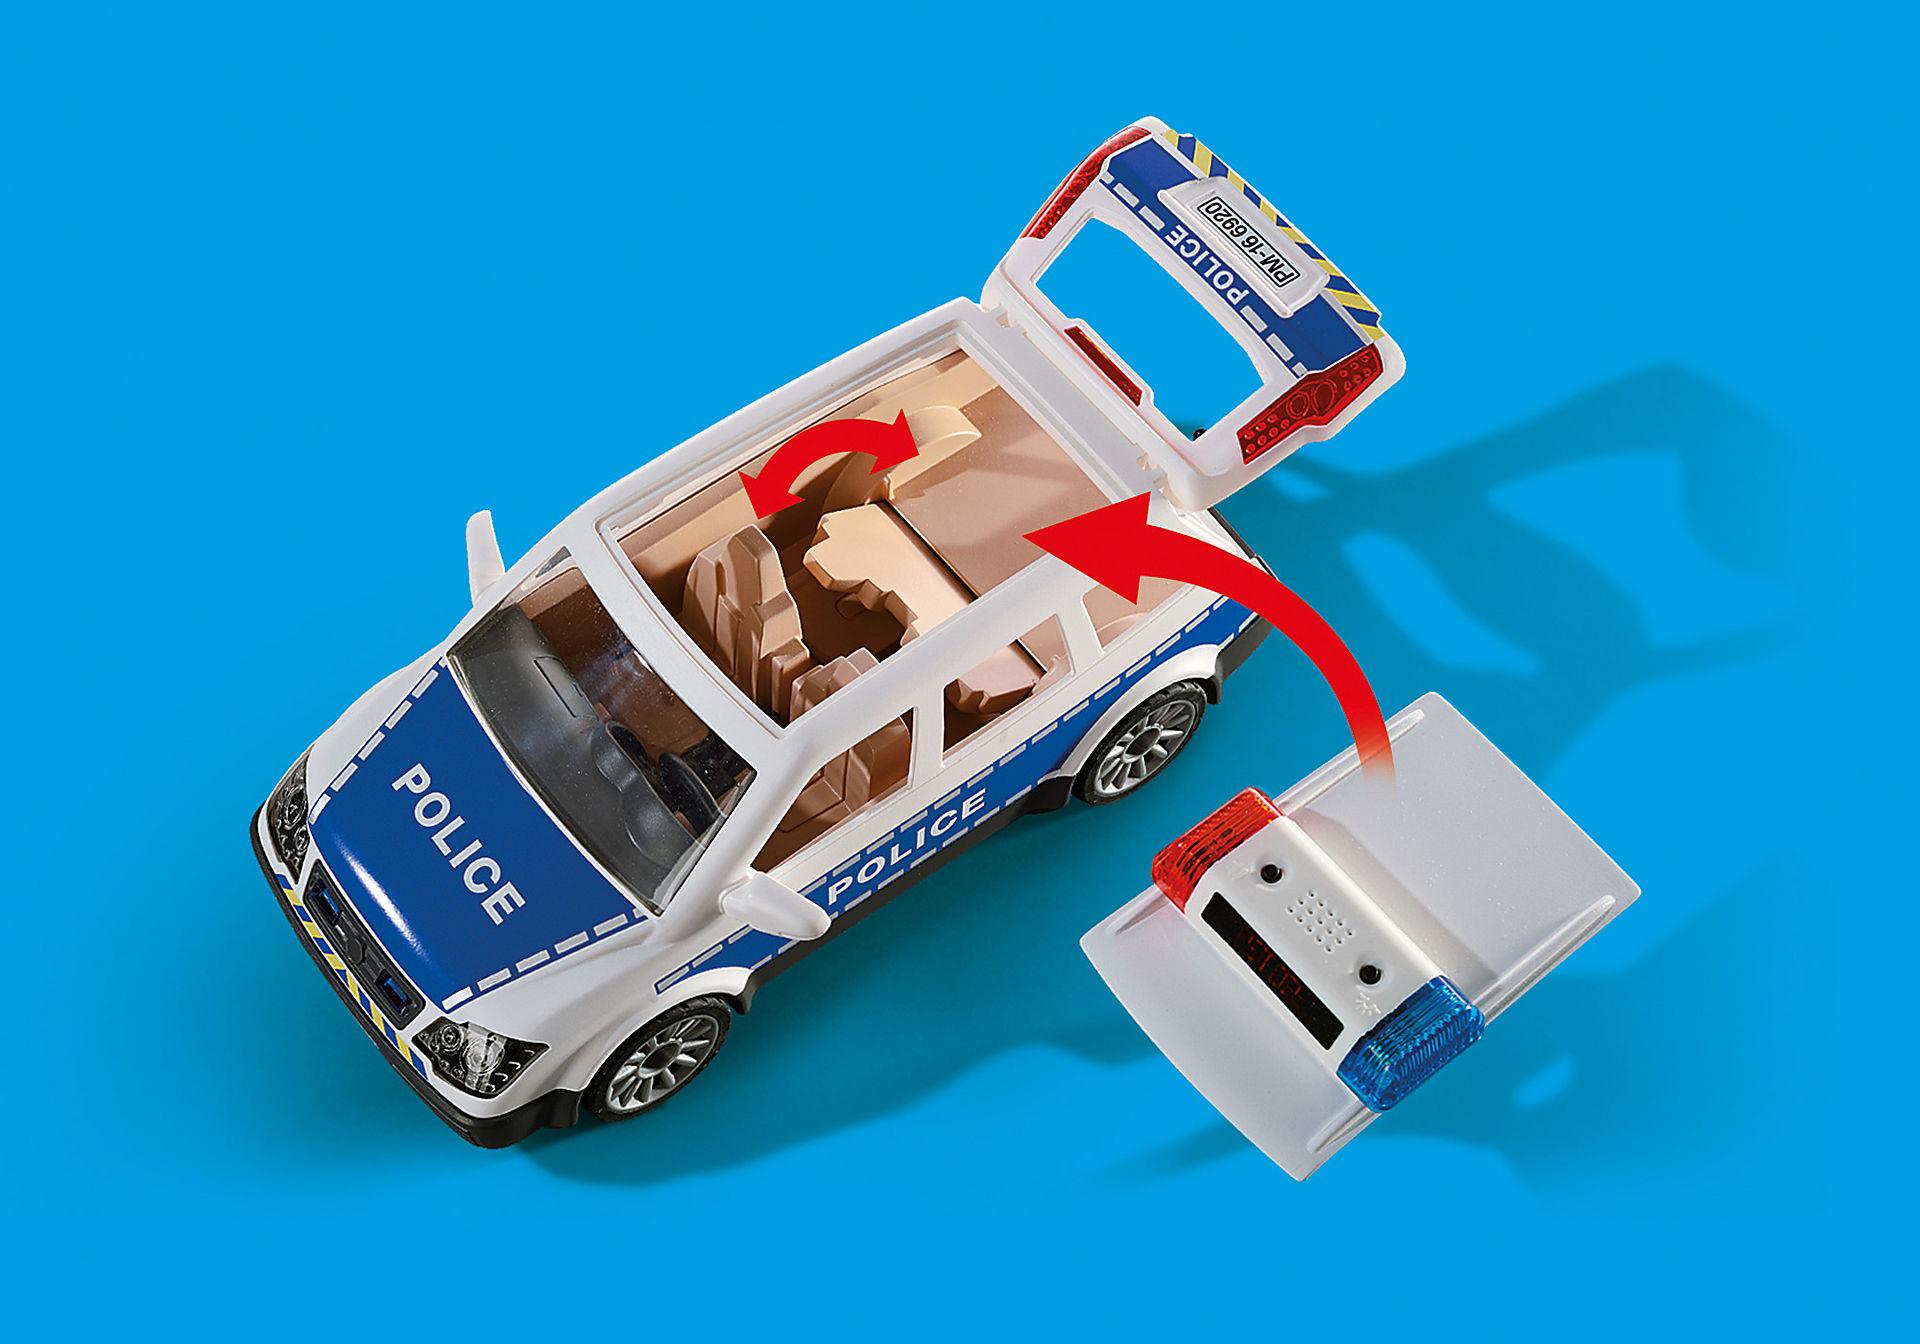 http://media.playmobil.com/i/playmobil/6920_product_extra1/Coche de Policía con Luces y Sonido